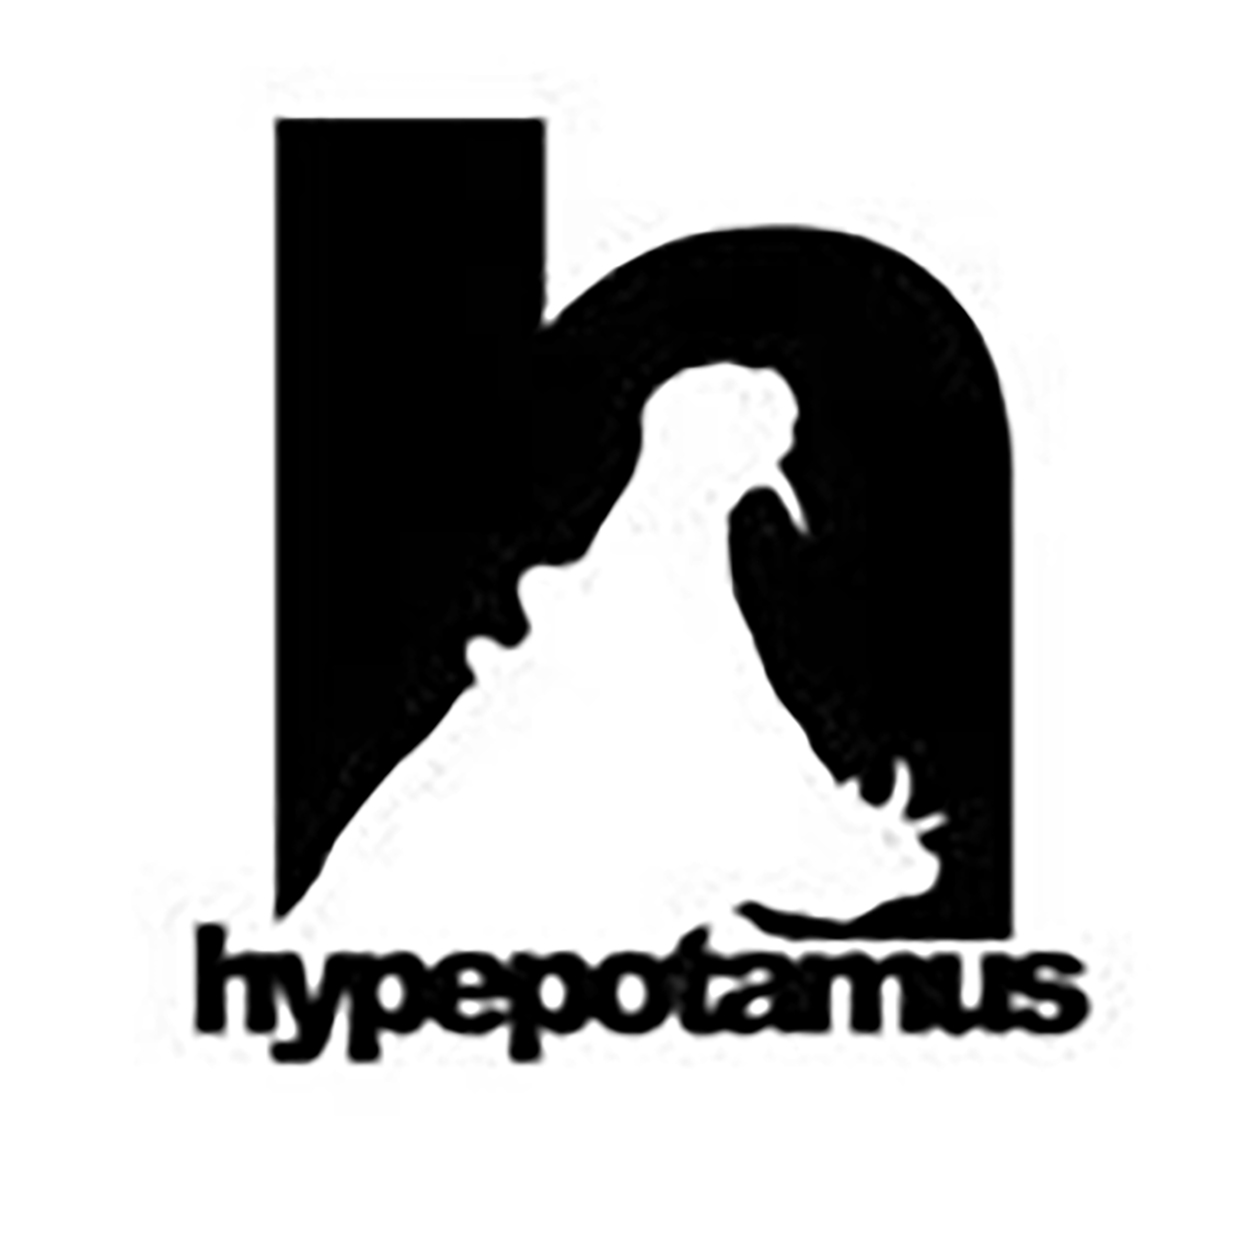 Hype2.jpg